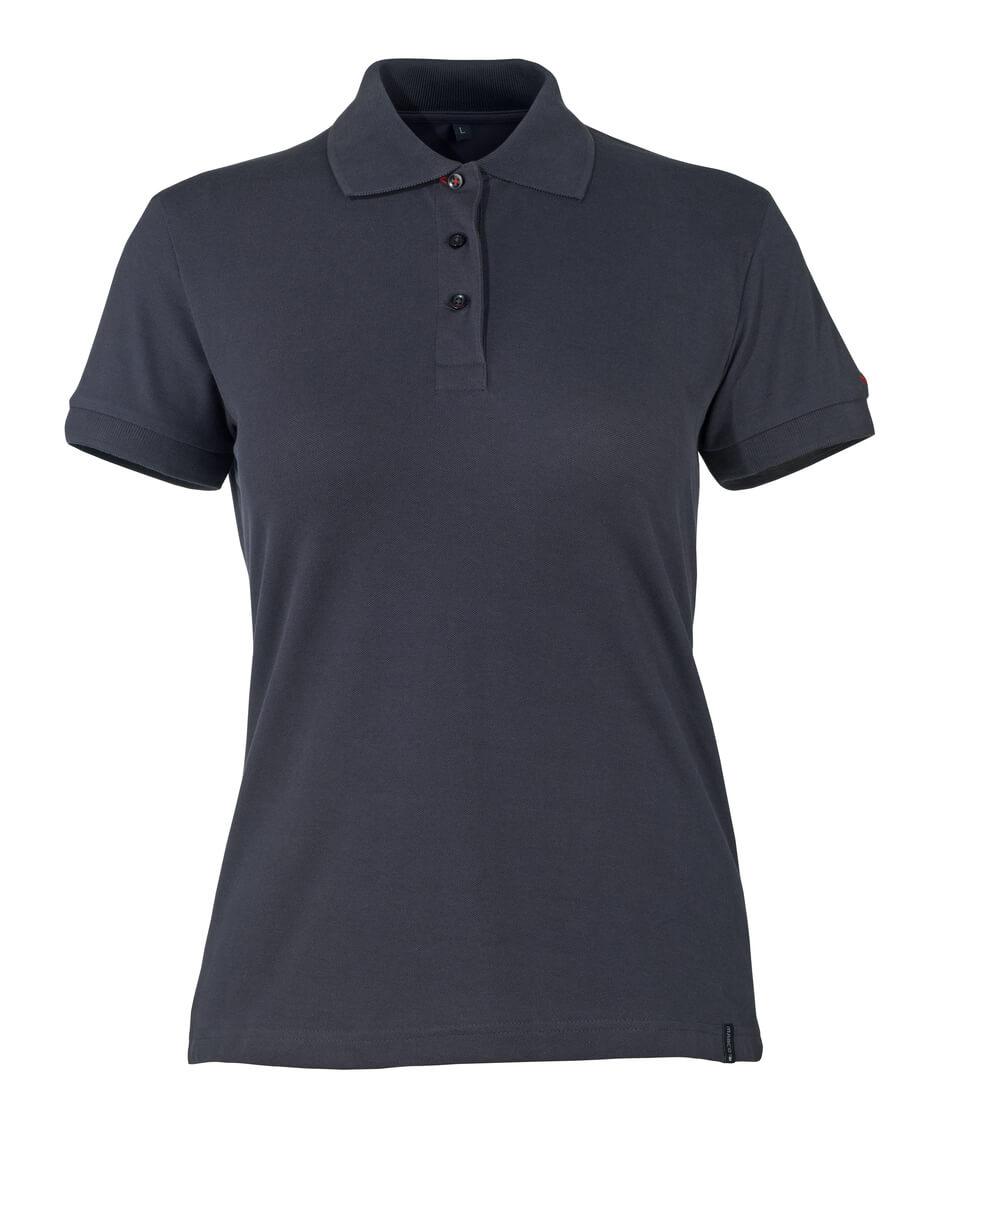 50363-861-010 Polo shirt - dark navy